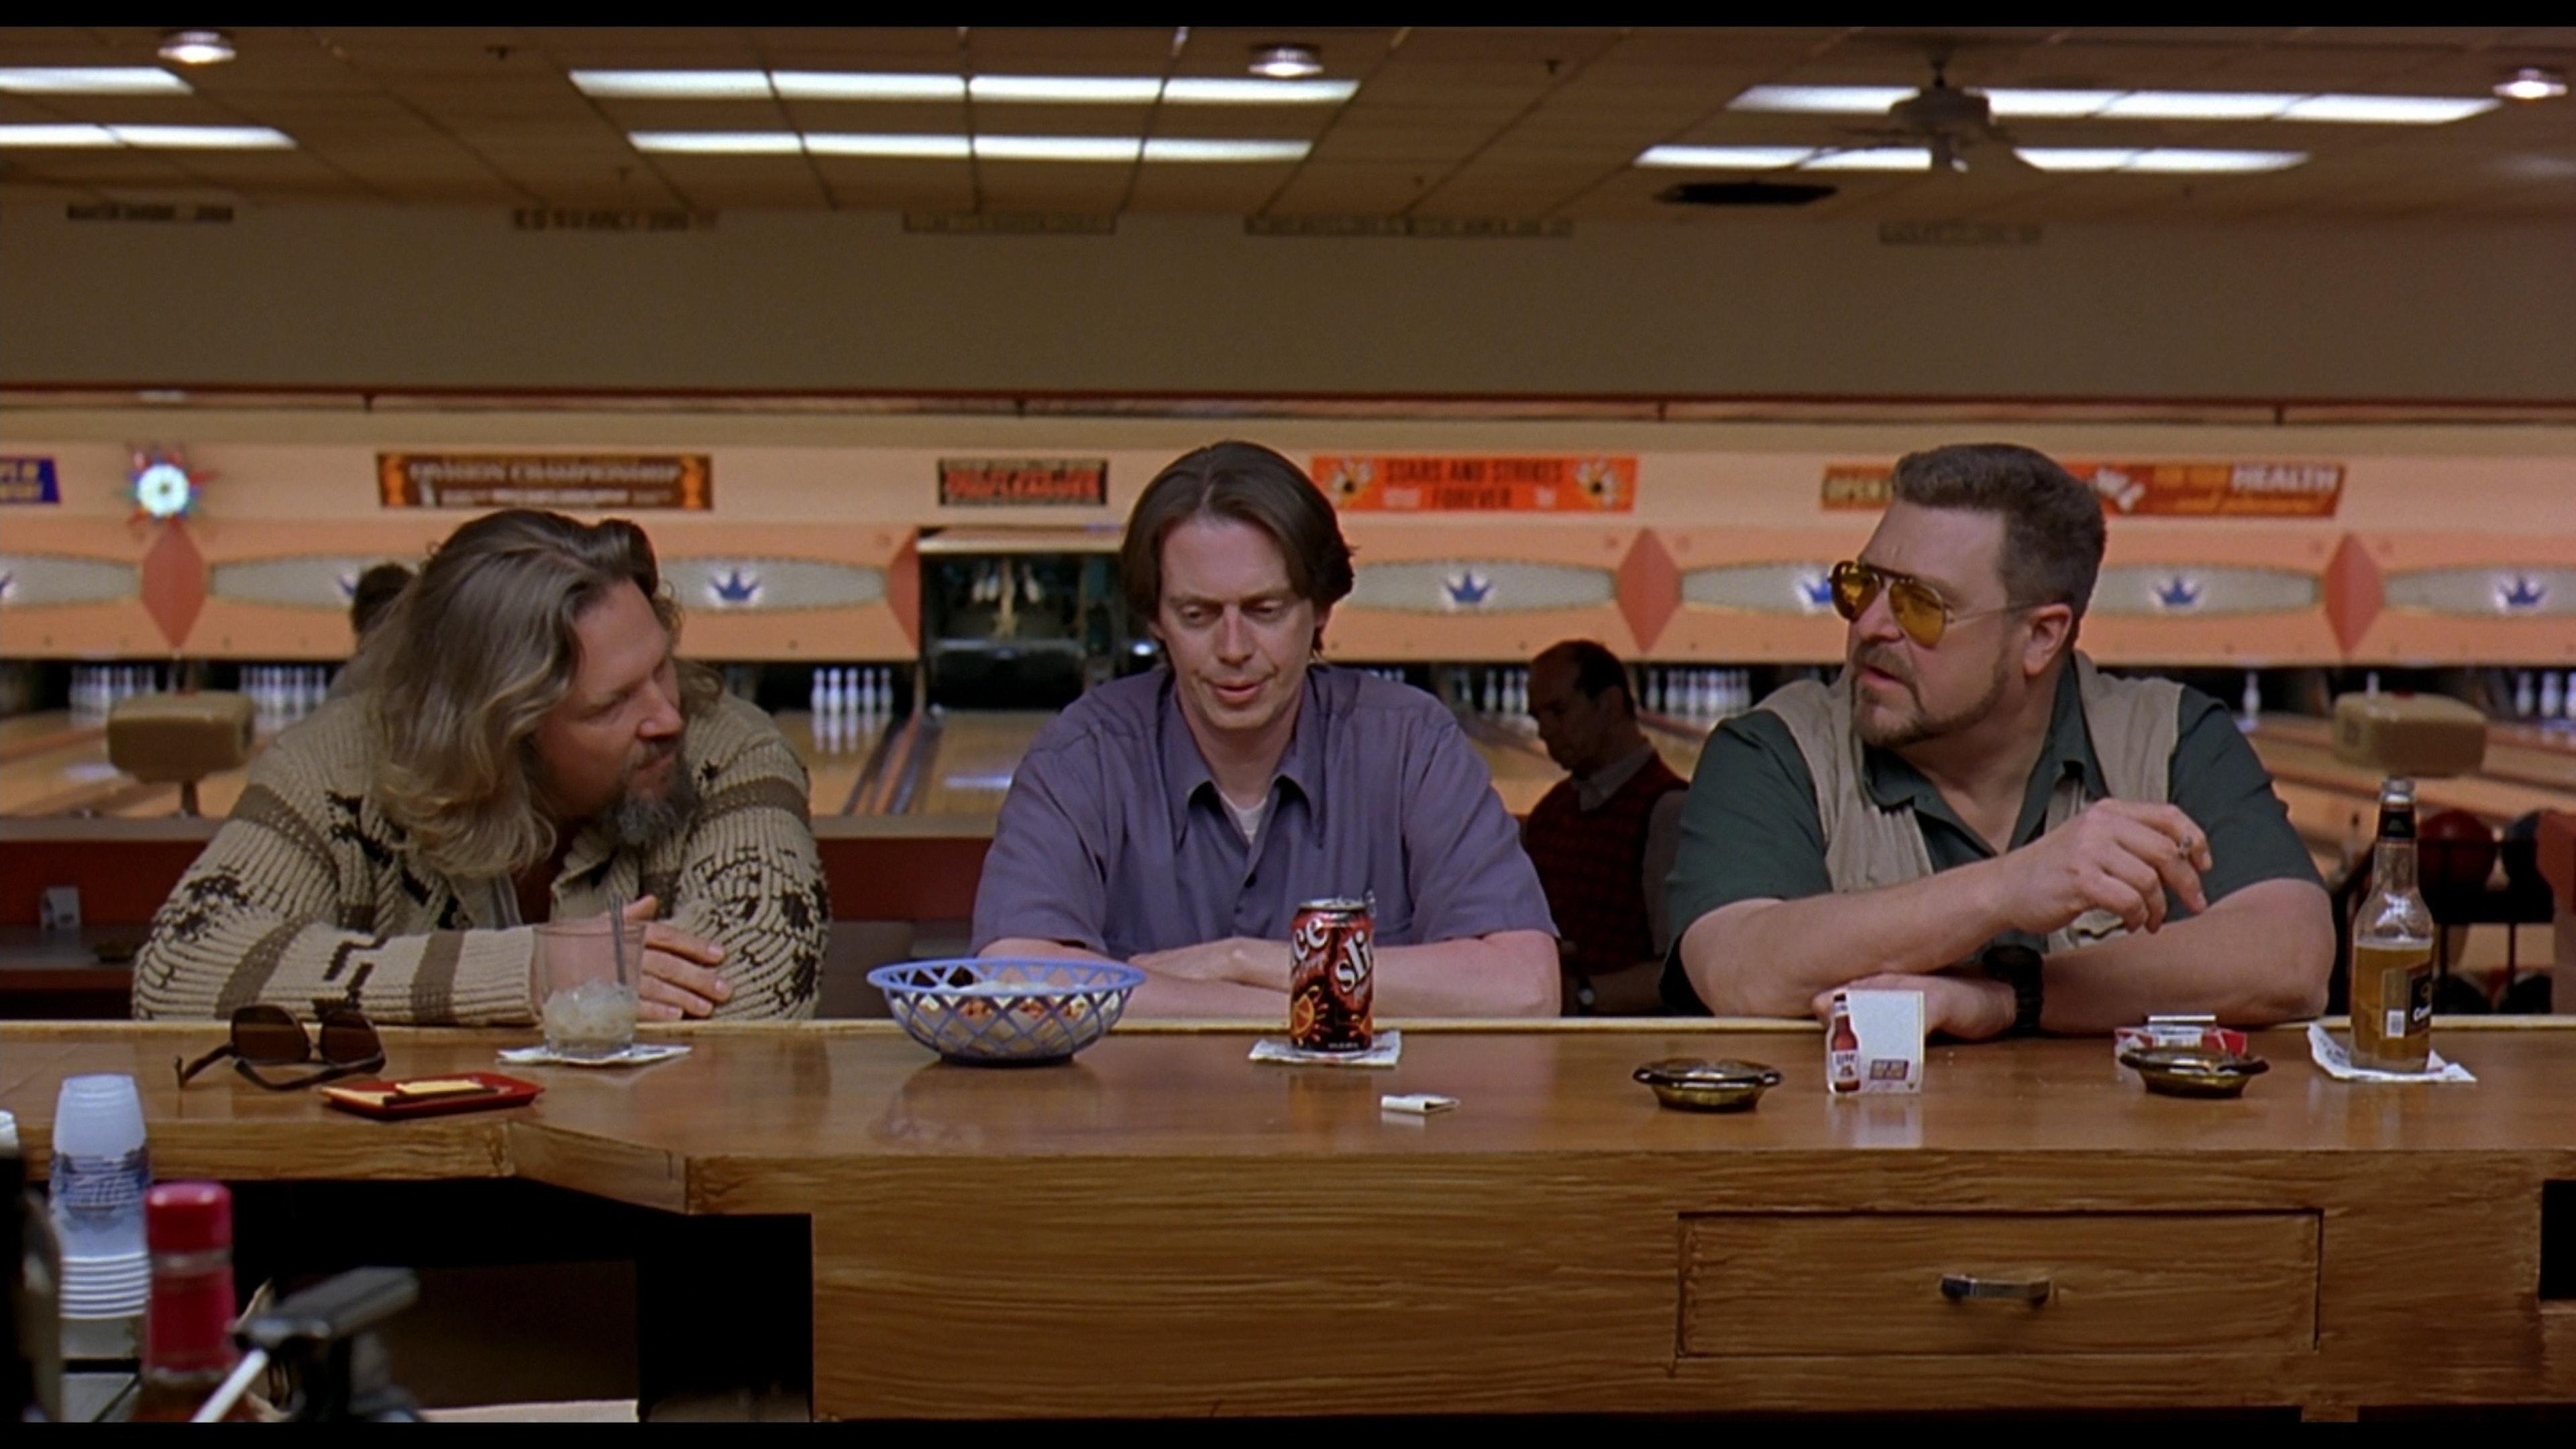 Jeff Bridges, Steve Buscemi, and John Goodman in 'The Big Lebowski'